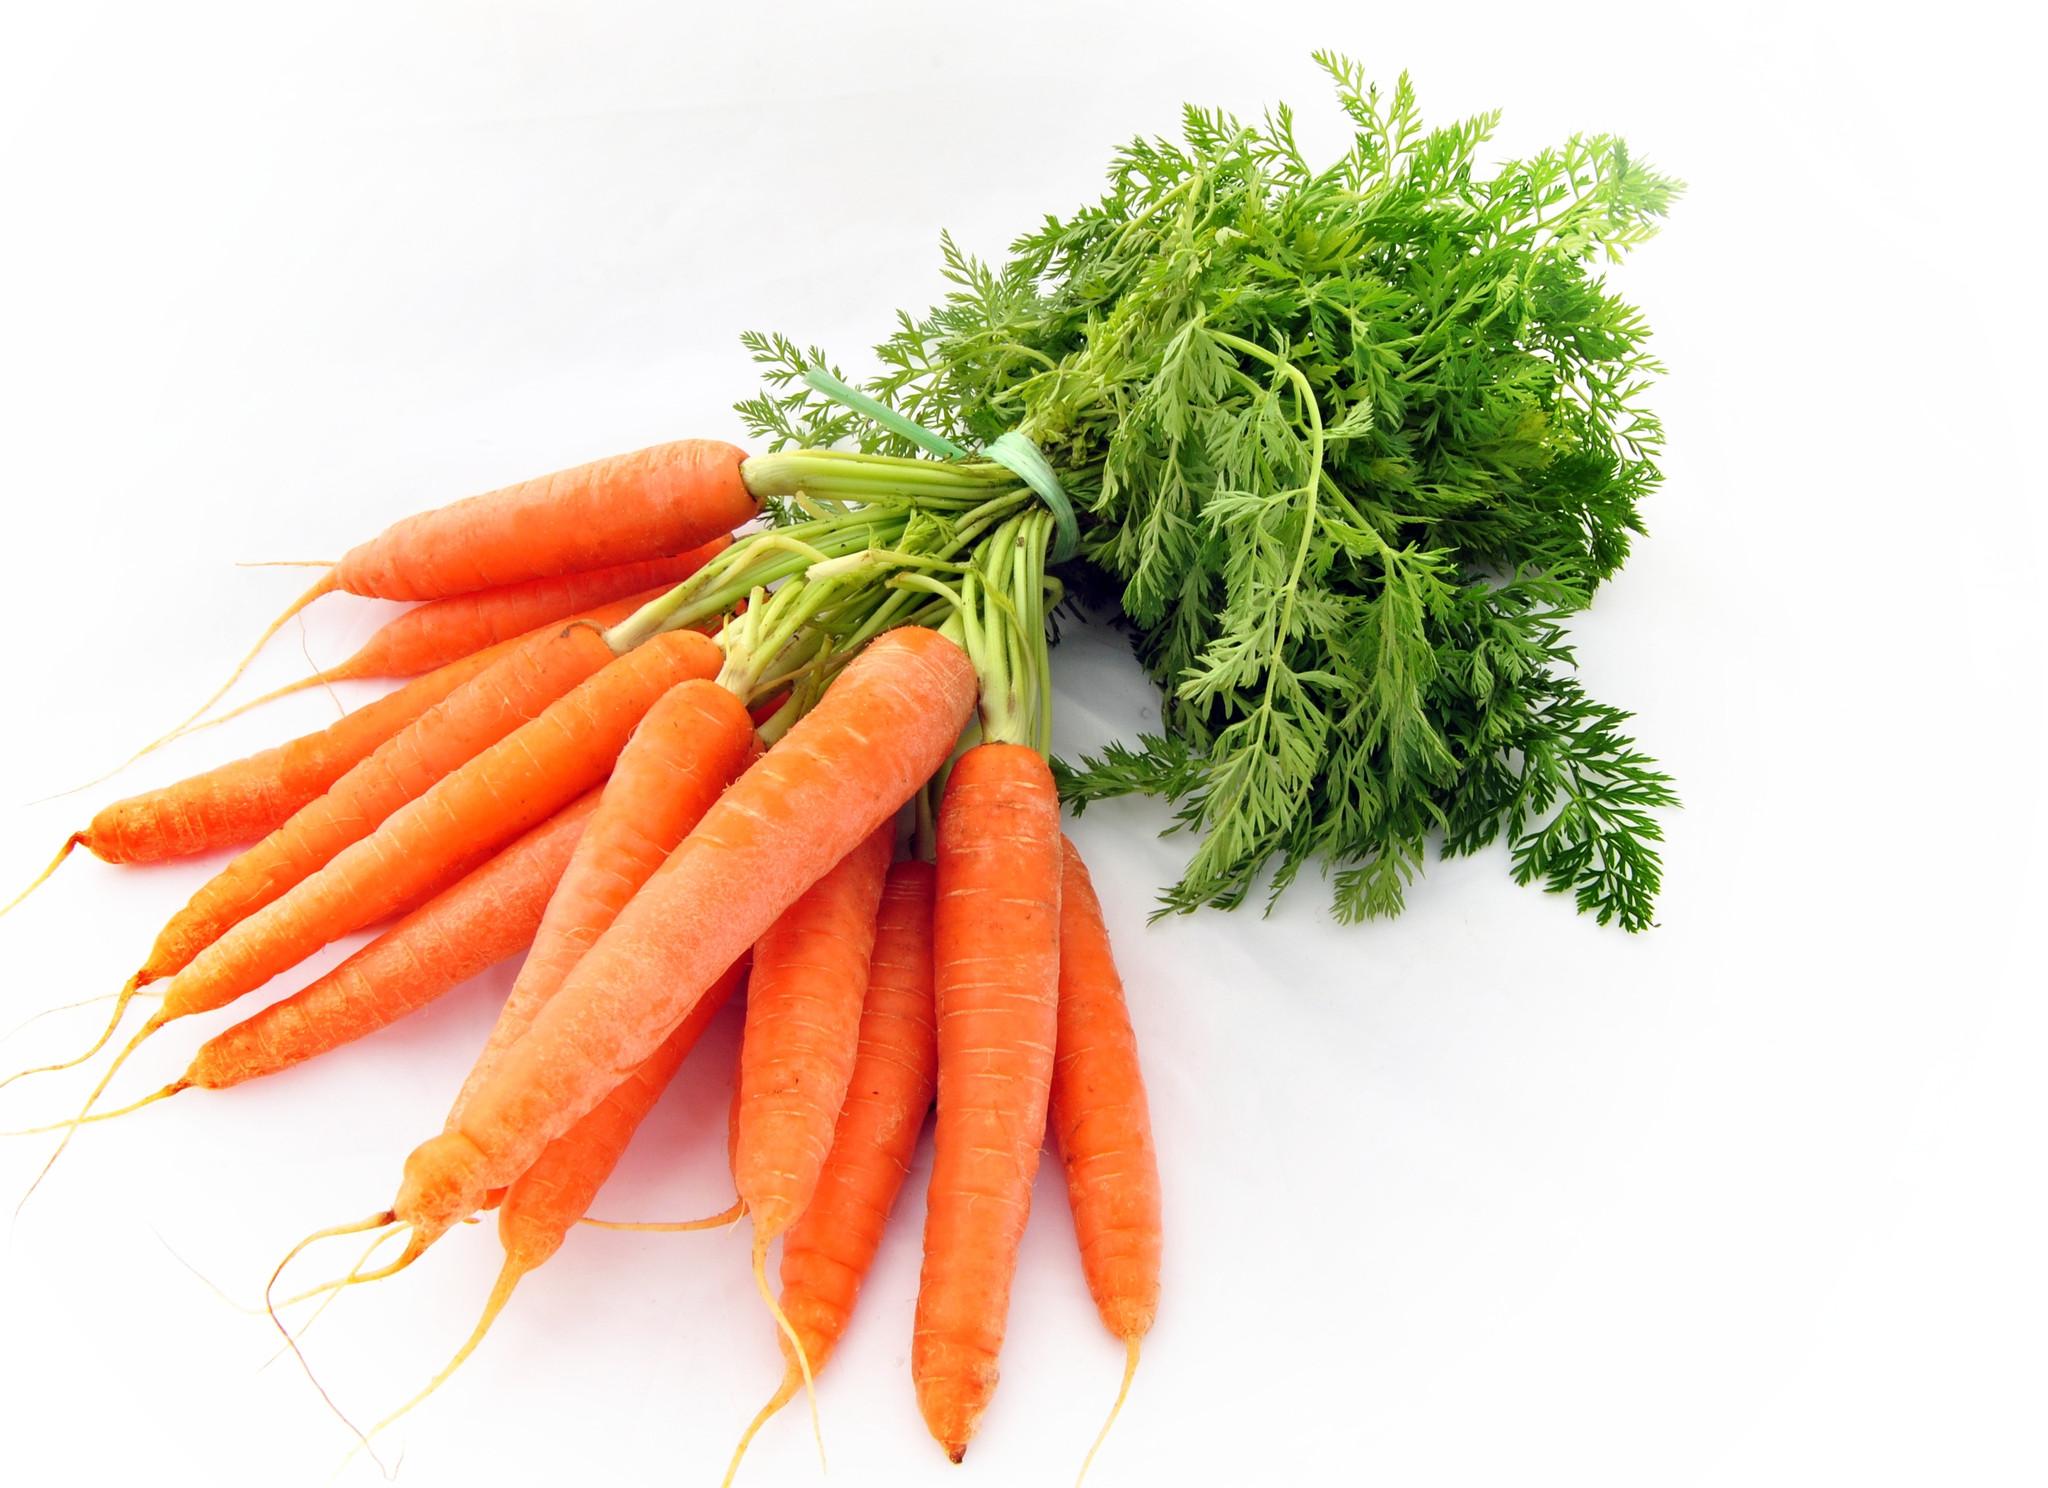 carrots. $1.50 per Pound.